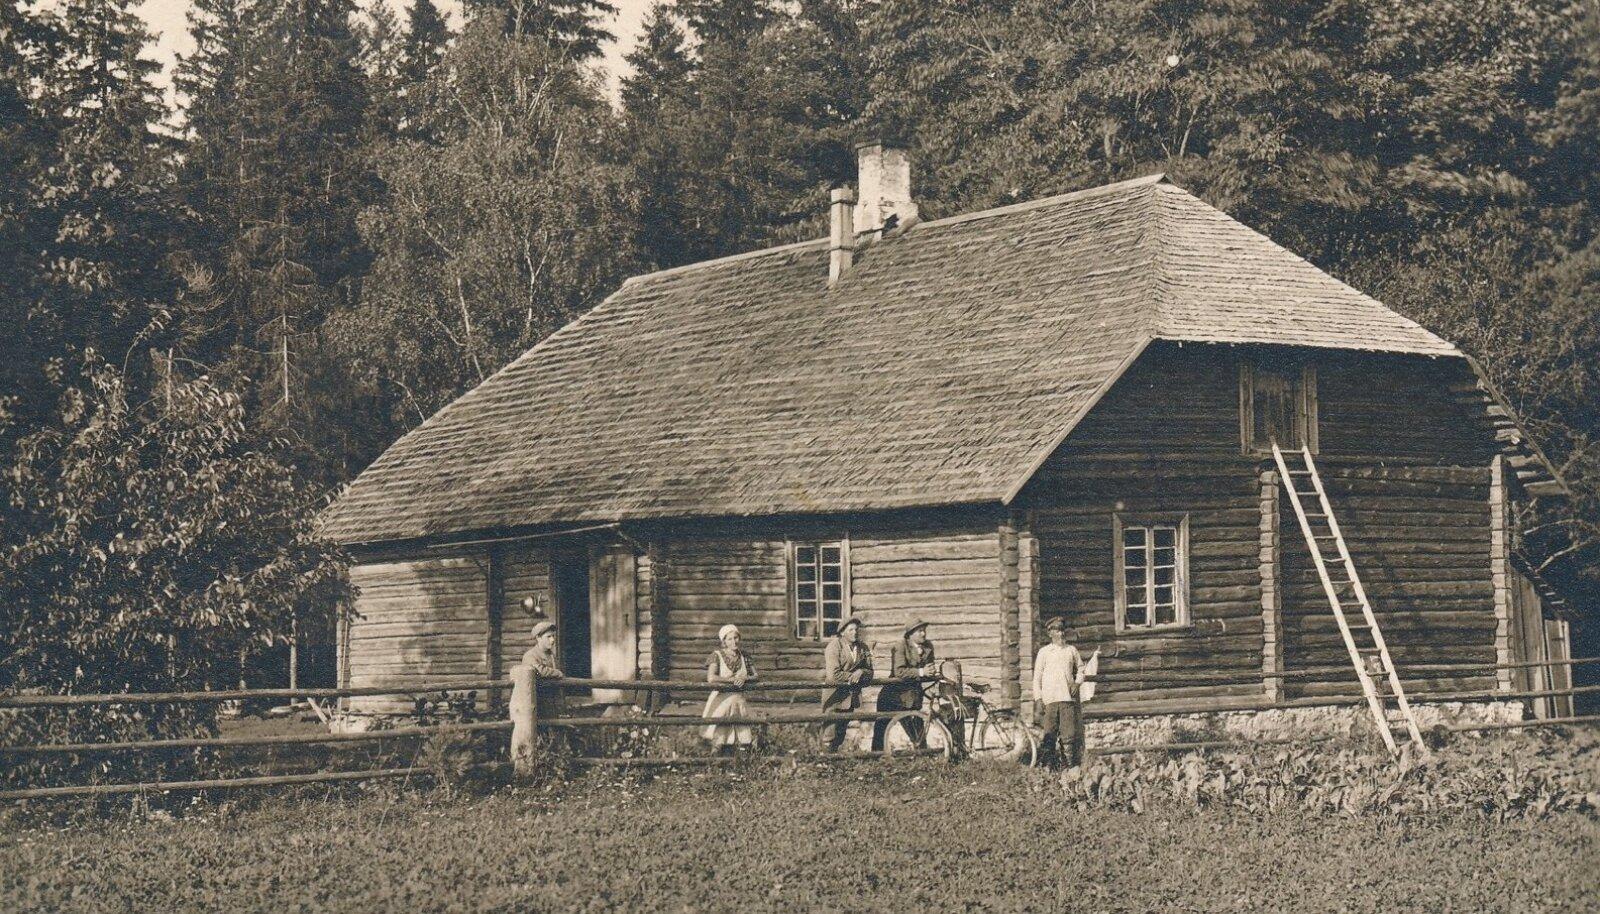 Roela metskonna metsavahi elumaja koos elanikega, 1932.